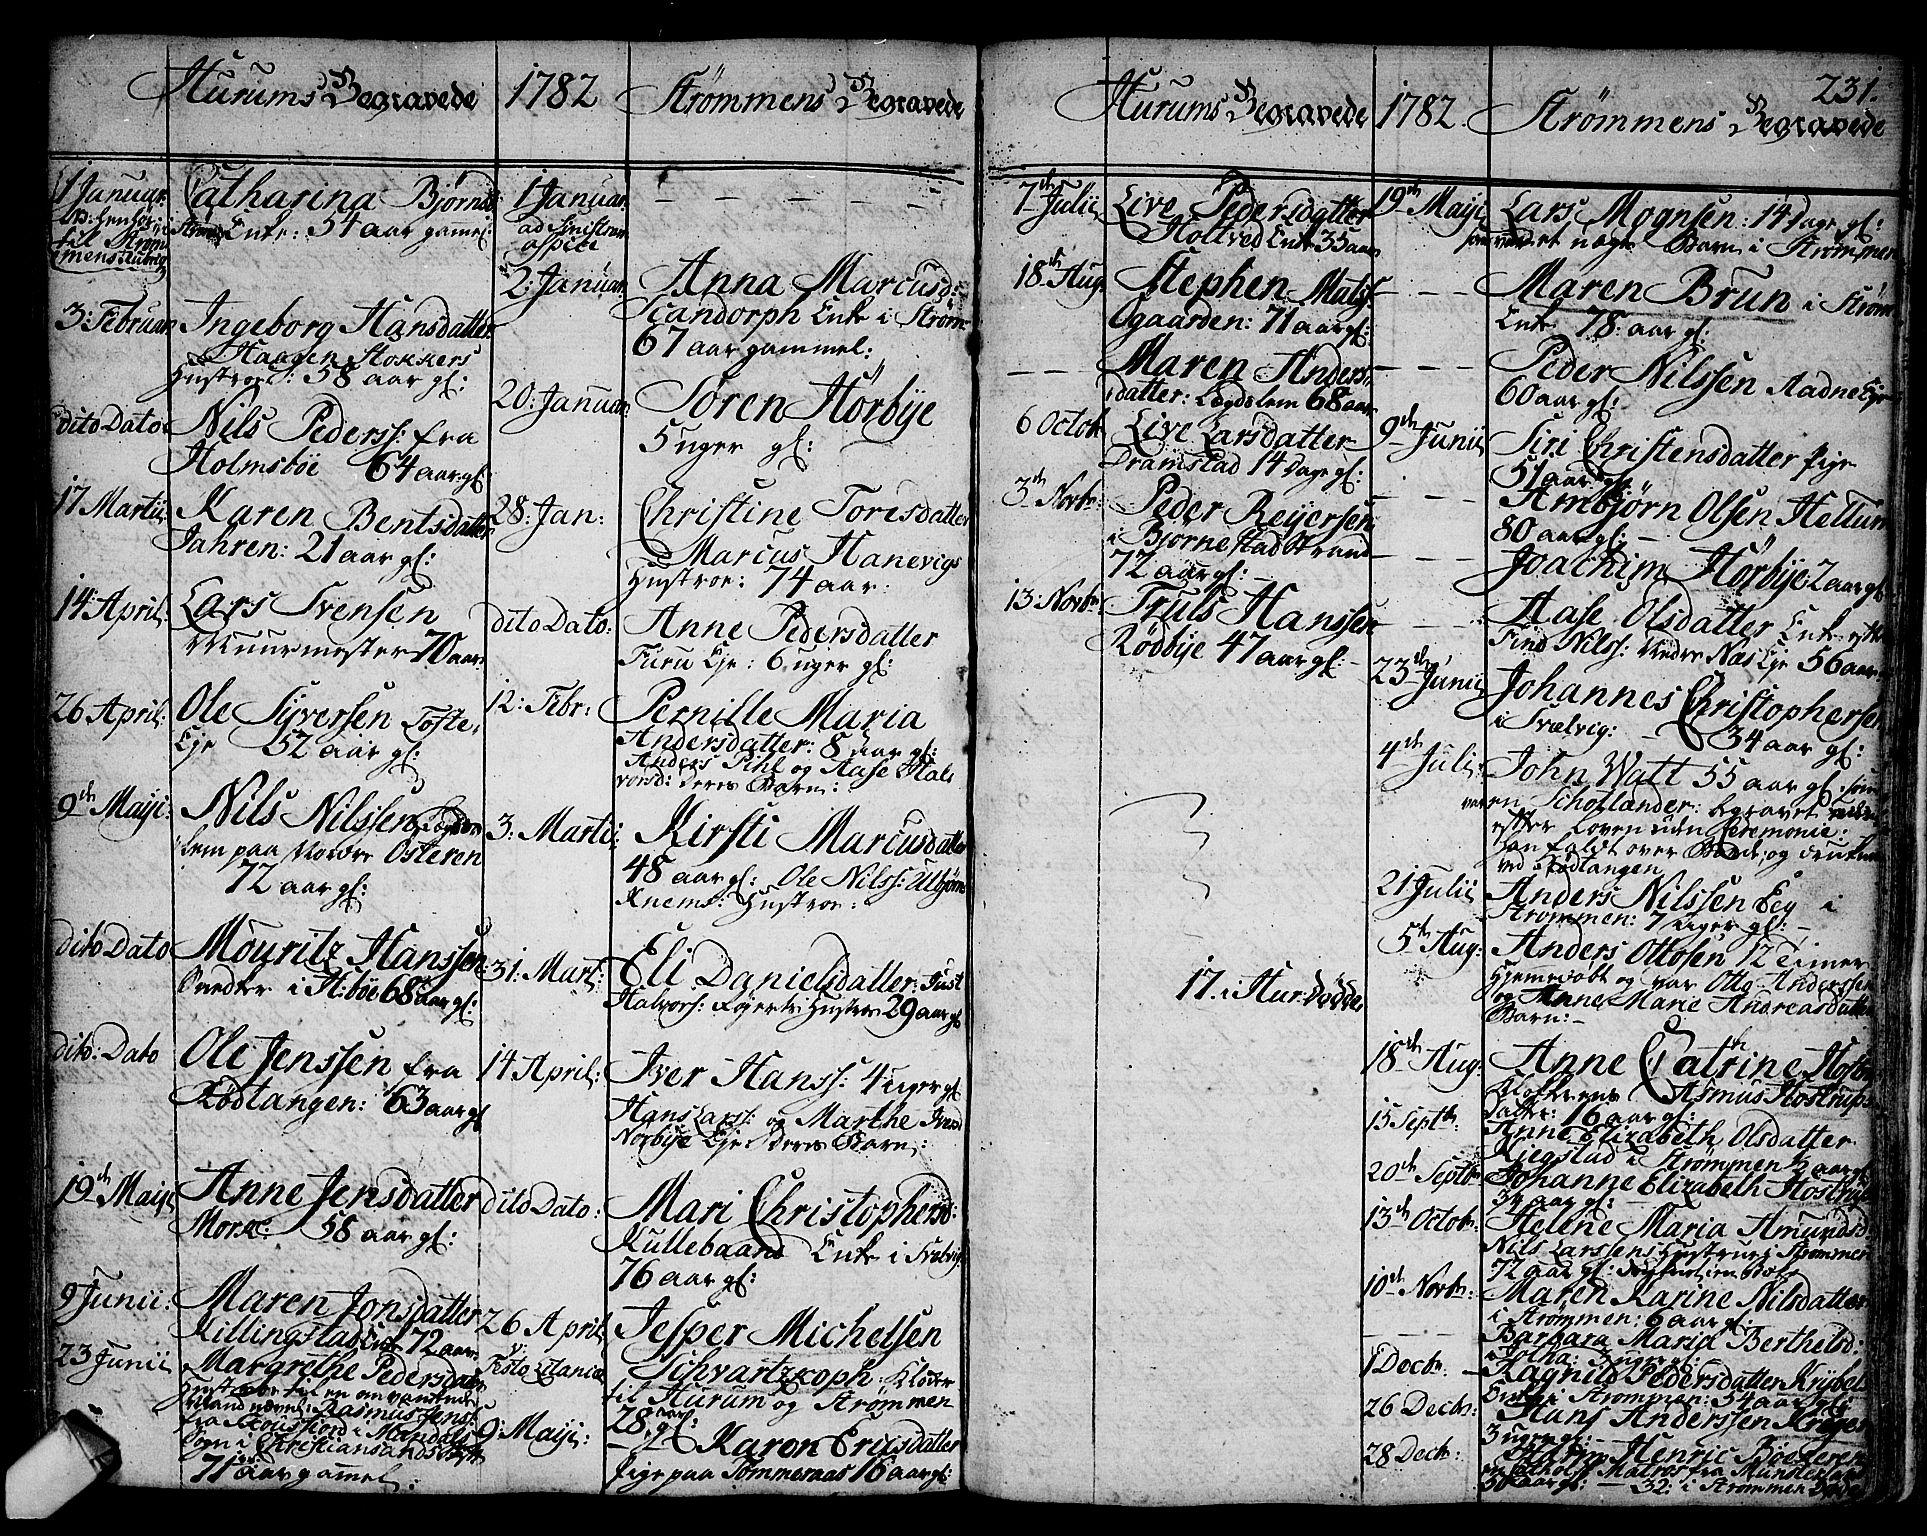 SAKO, Hurum kirkebøker, F/Fa/L0007: Ministerialbok nr. 7, 1771-1810, s. 231